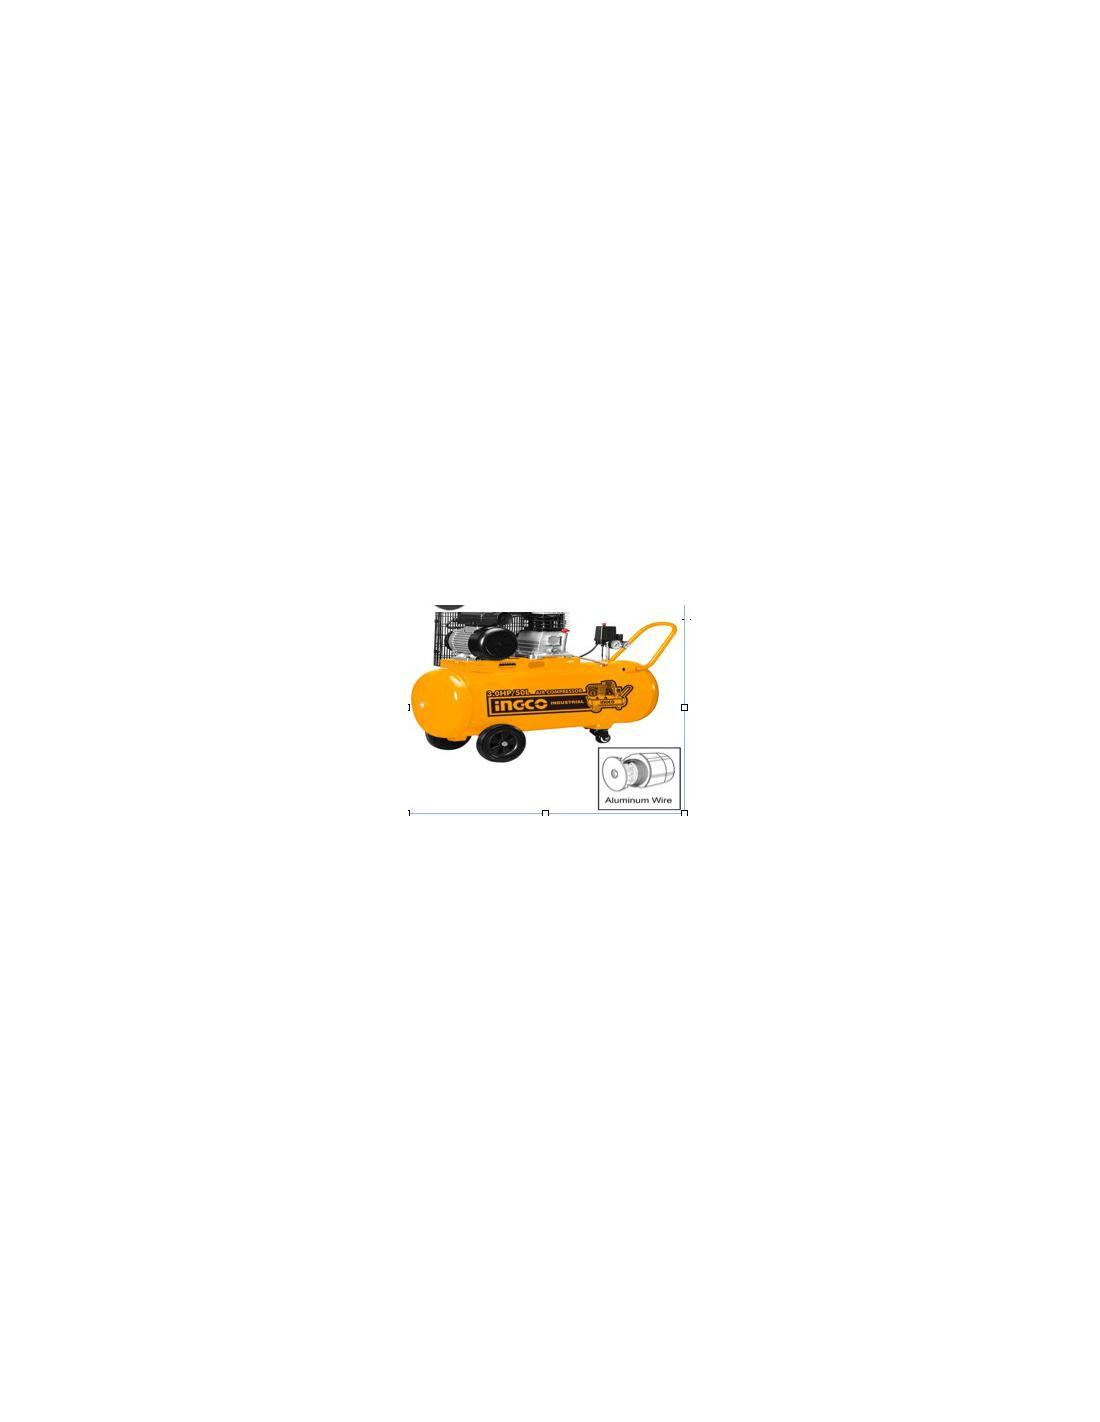 Compresseur INGCO 50L 220-240V~50Hz Power: 2.2 kW - 1